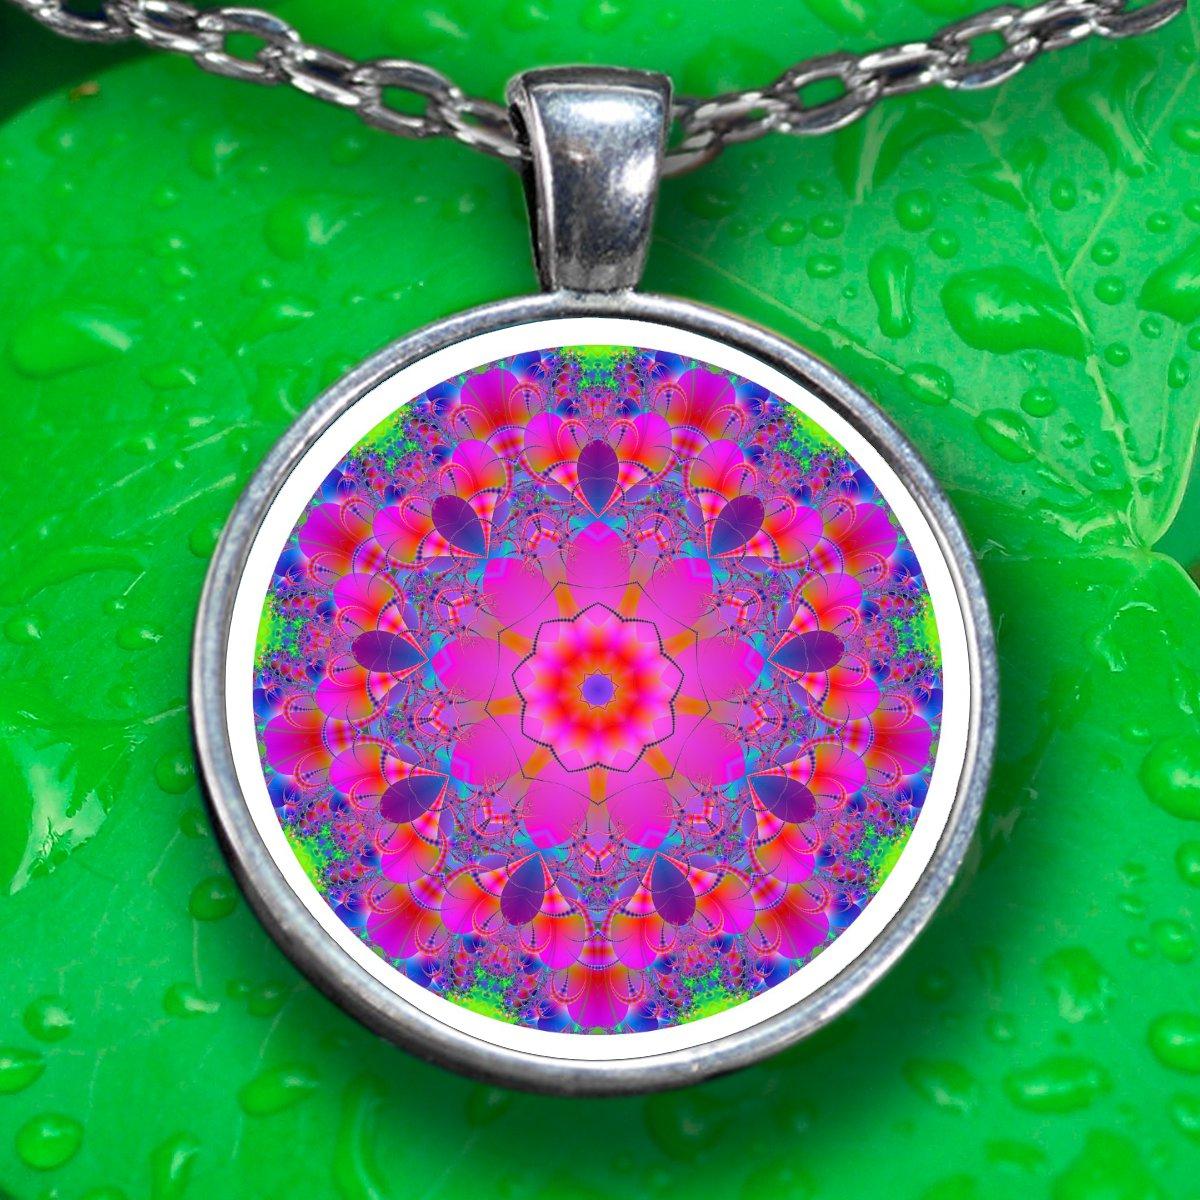 Mandala Pendant Necklace - Silver Plated - FREE Shipping!